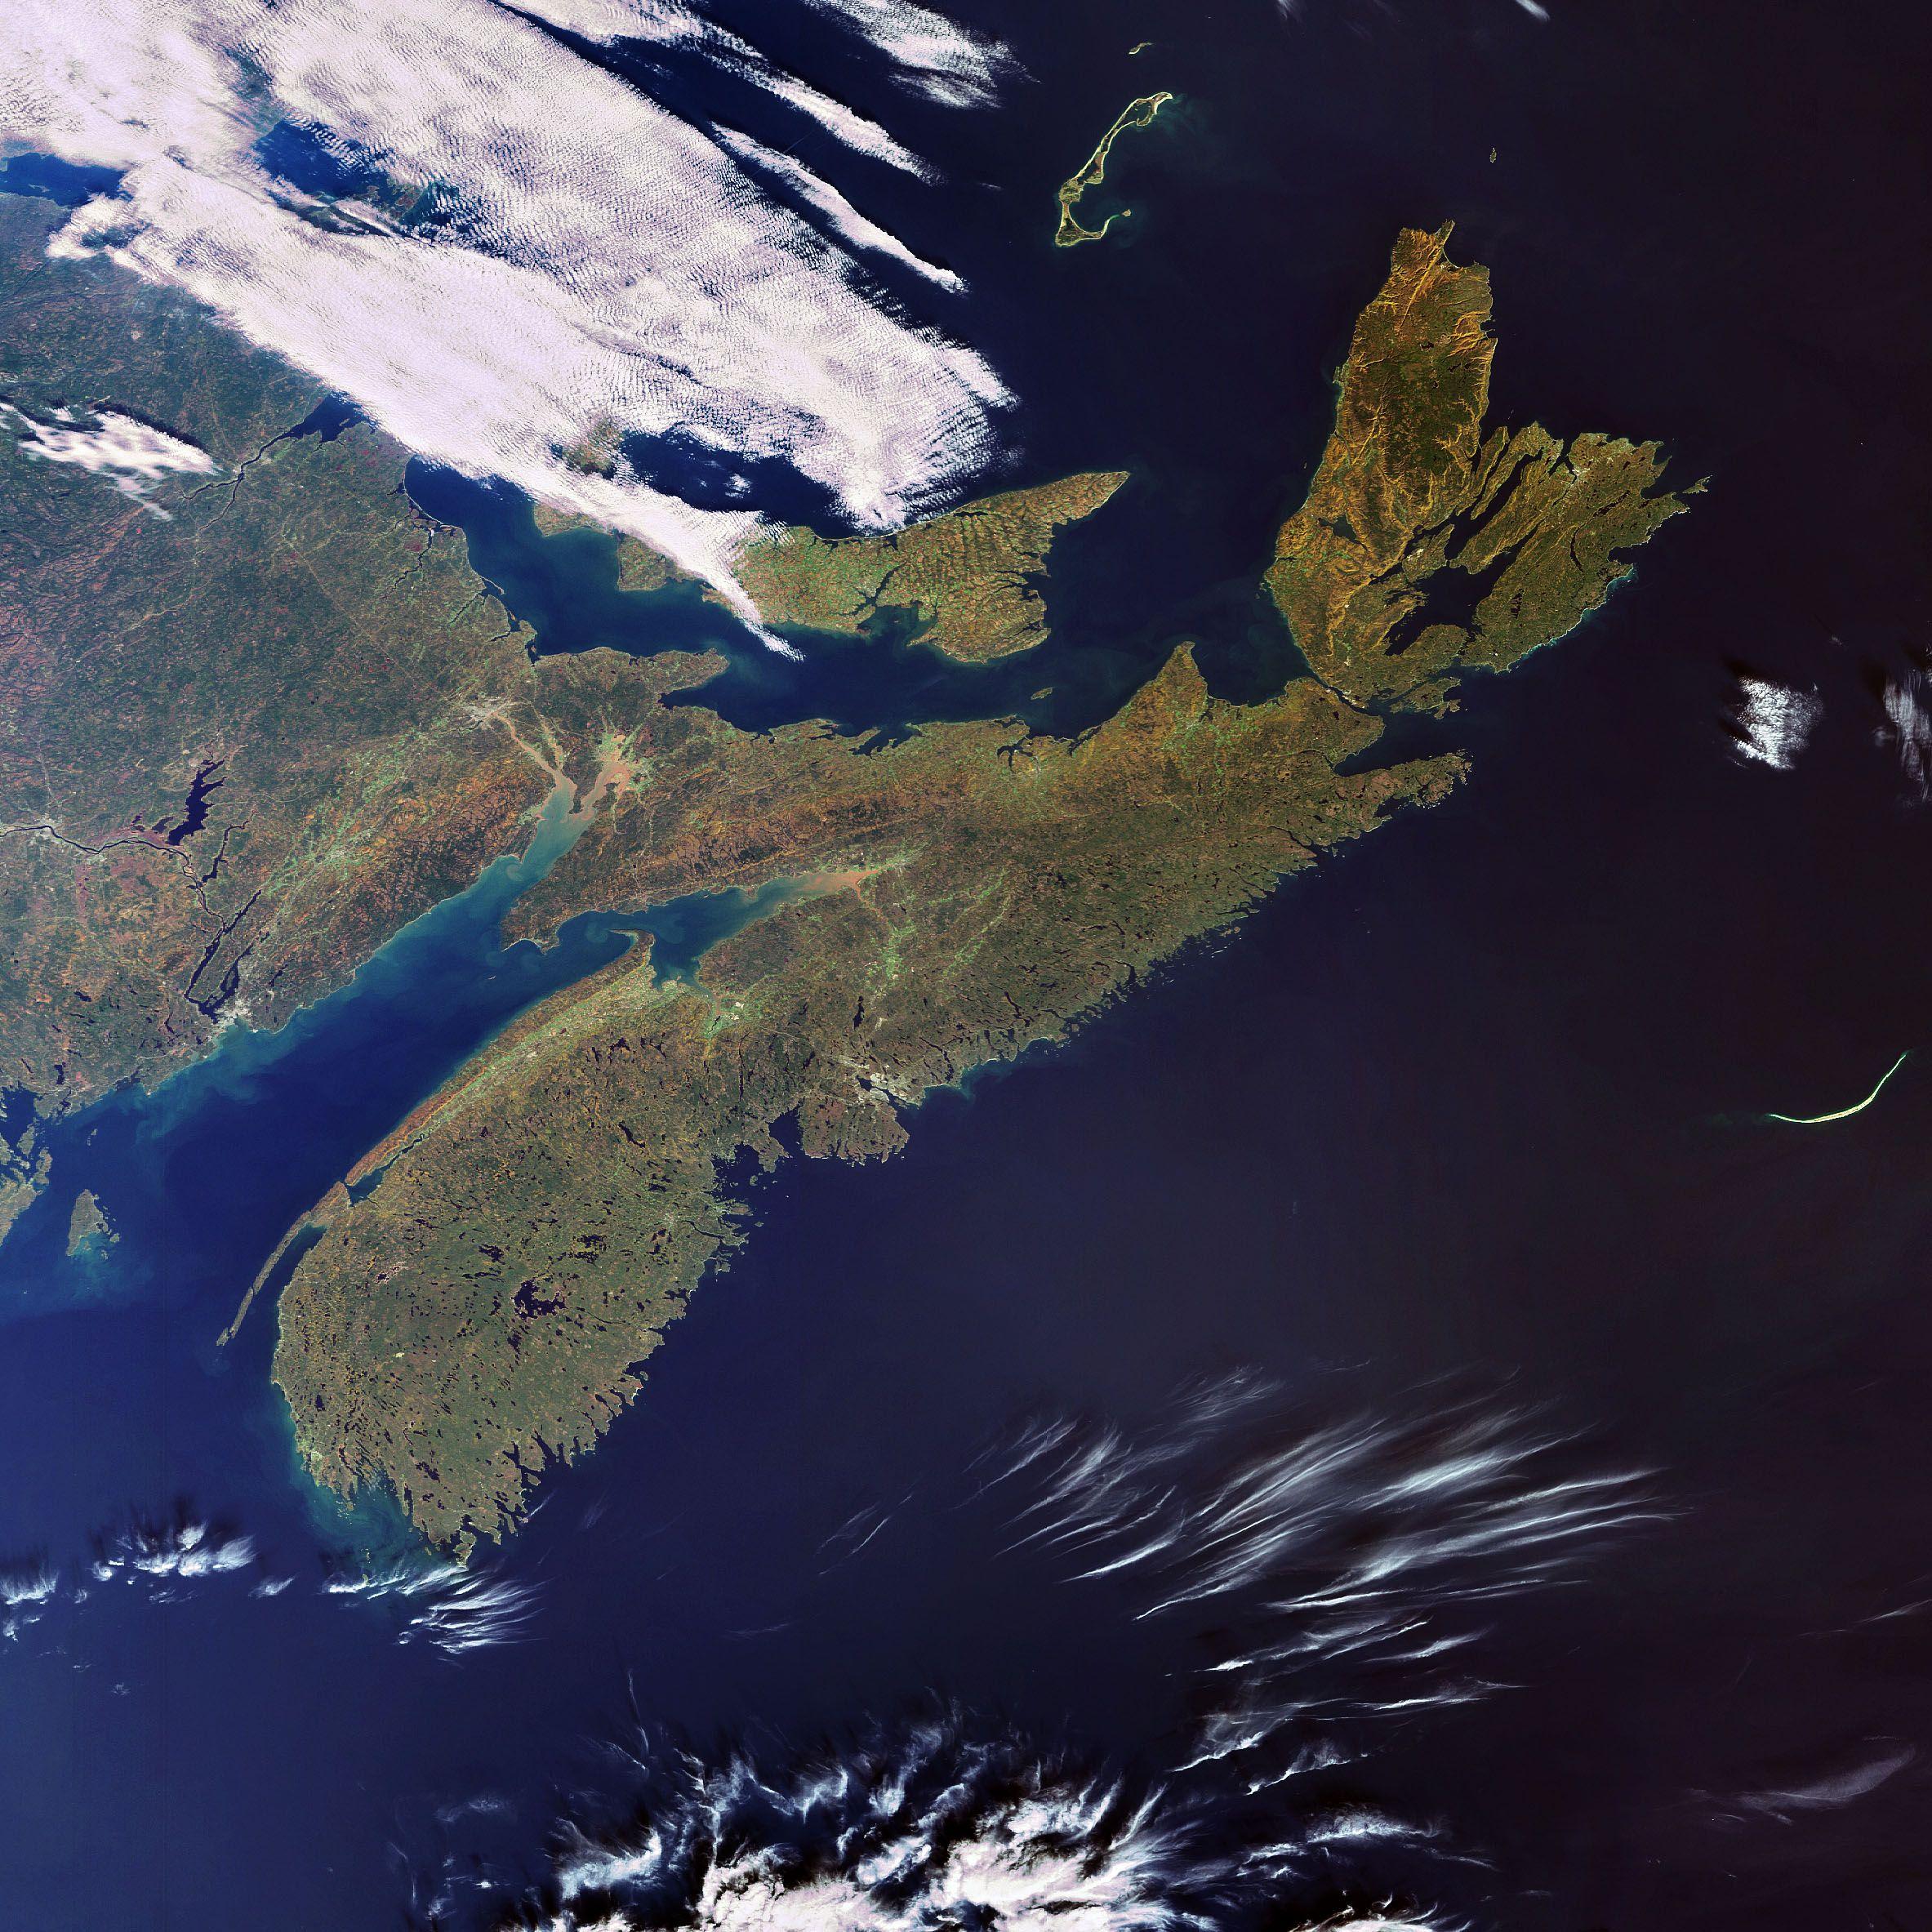 The View Of Nova Scotia From Space Nova Scotia Cape Breton